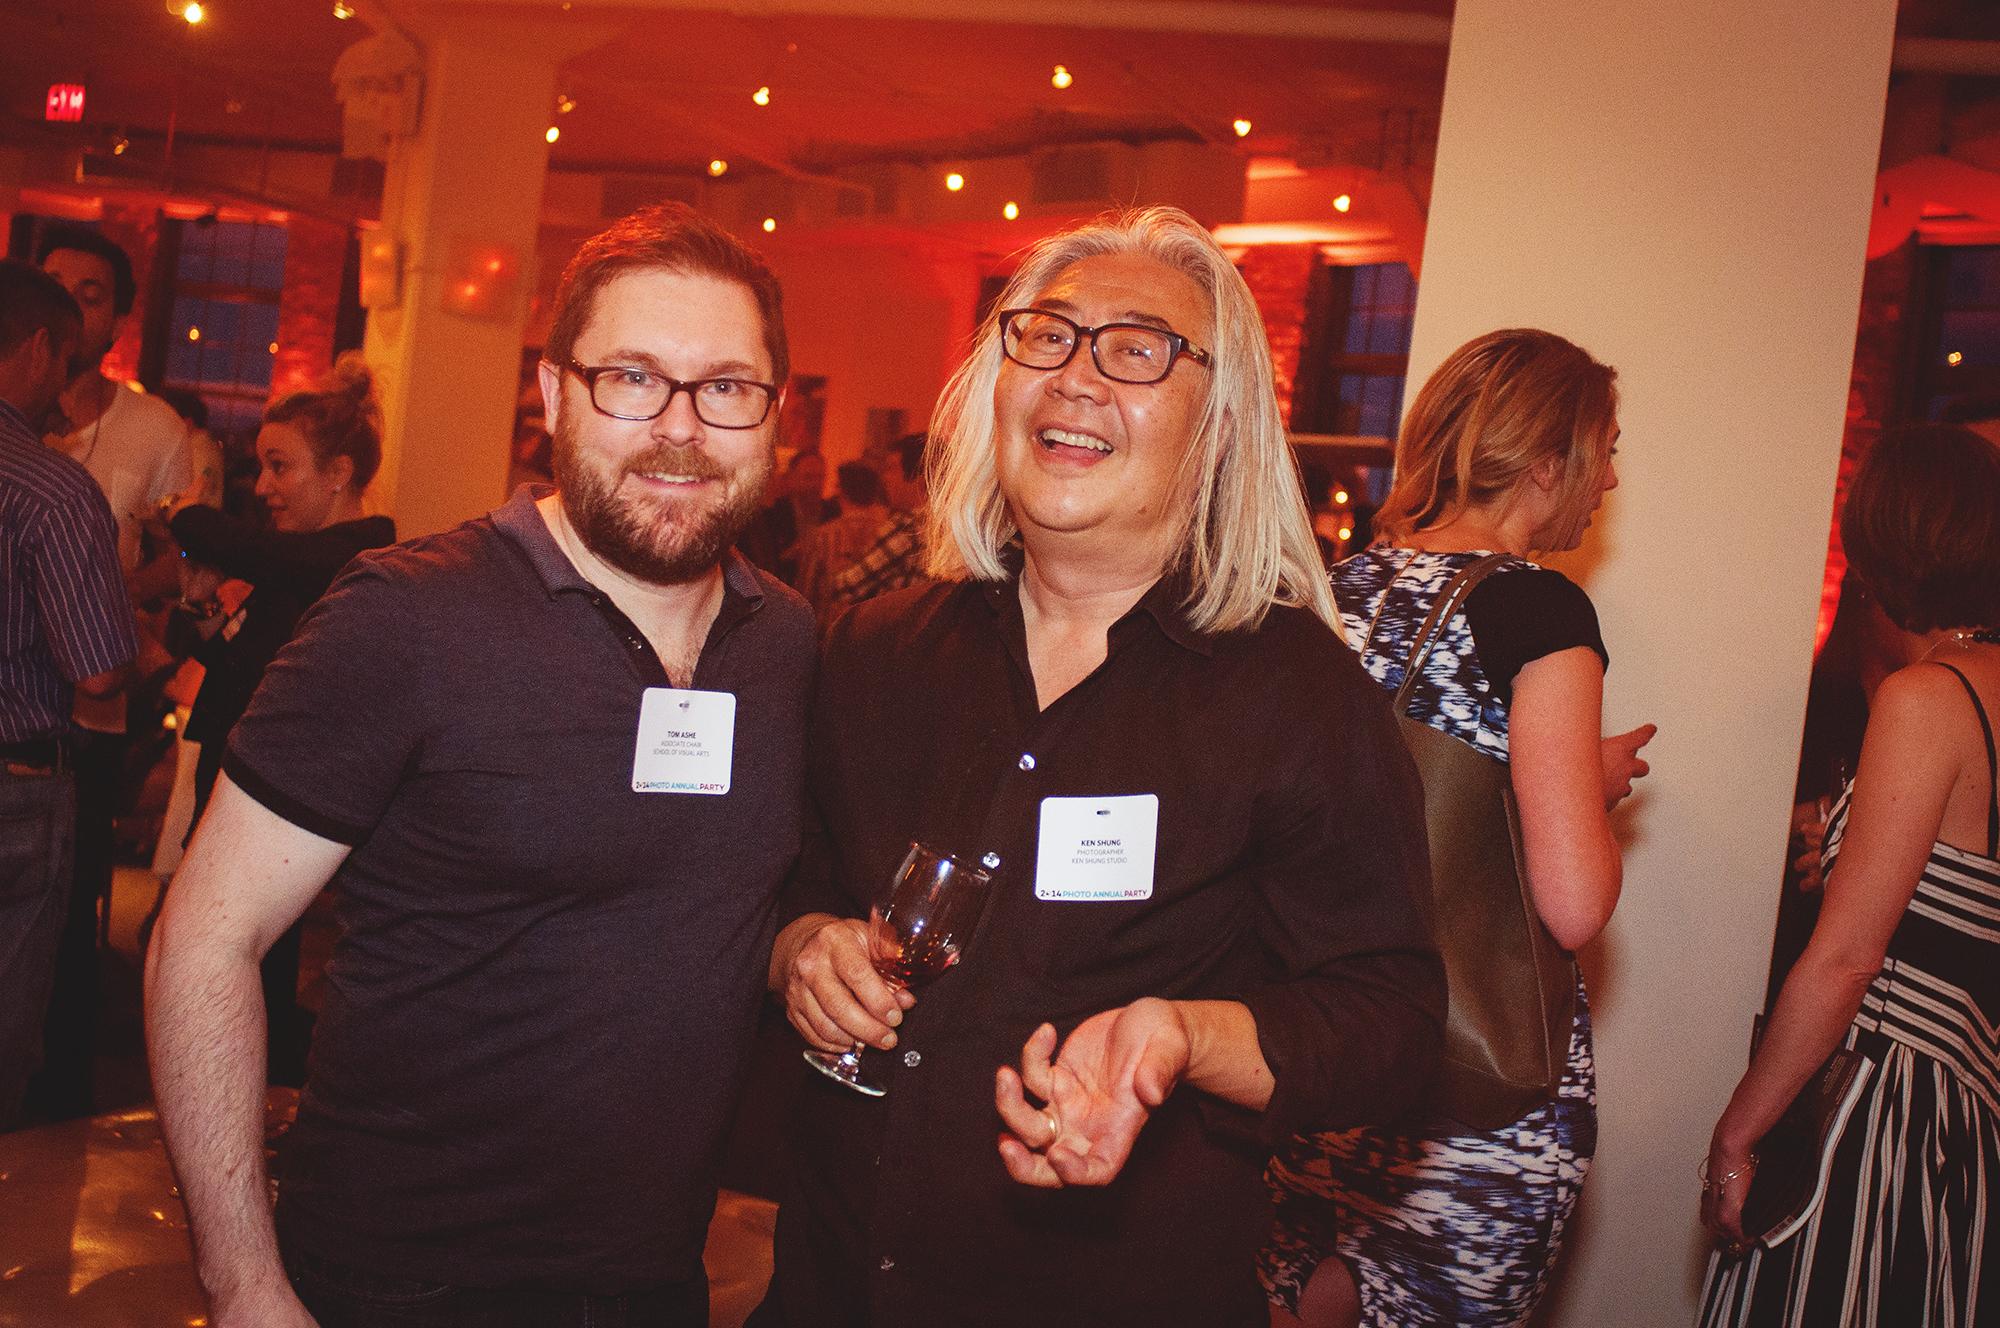 Tom Ashe & Ken Shung